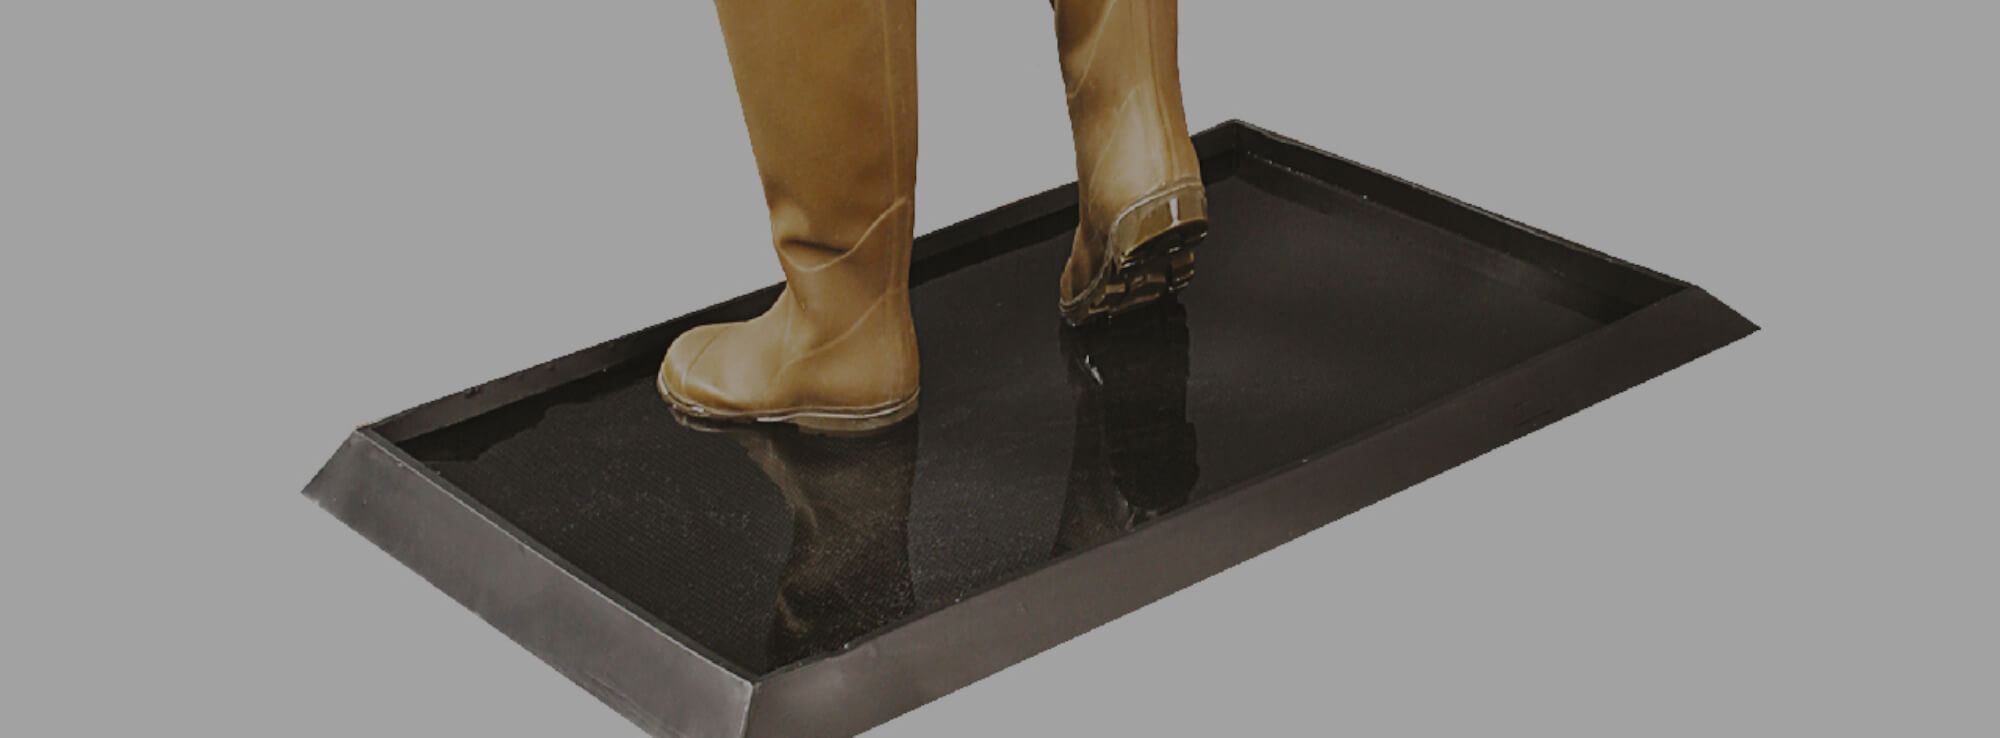 Sanitizing Footbath Mat, TALL WALL, disinfect, kill virus, virus, decontaminate